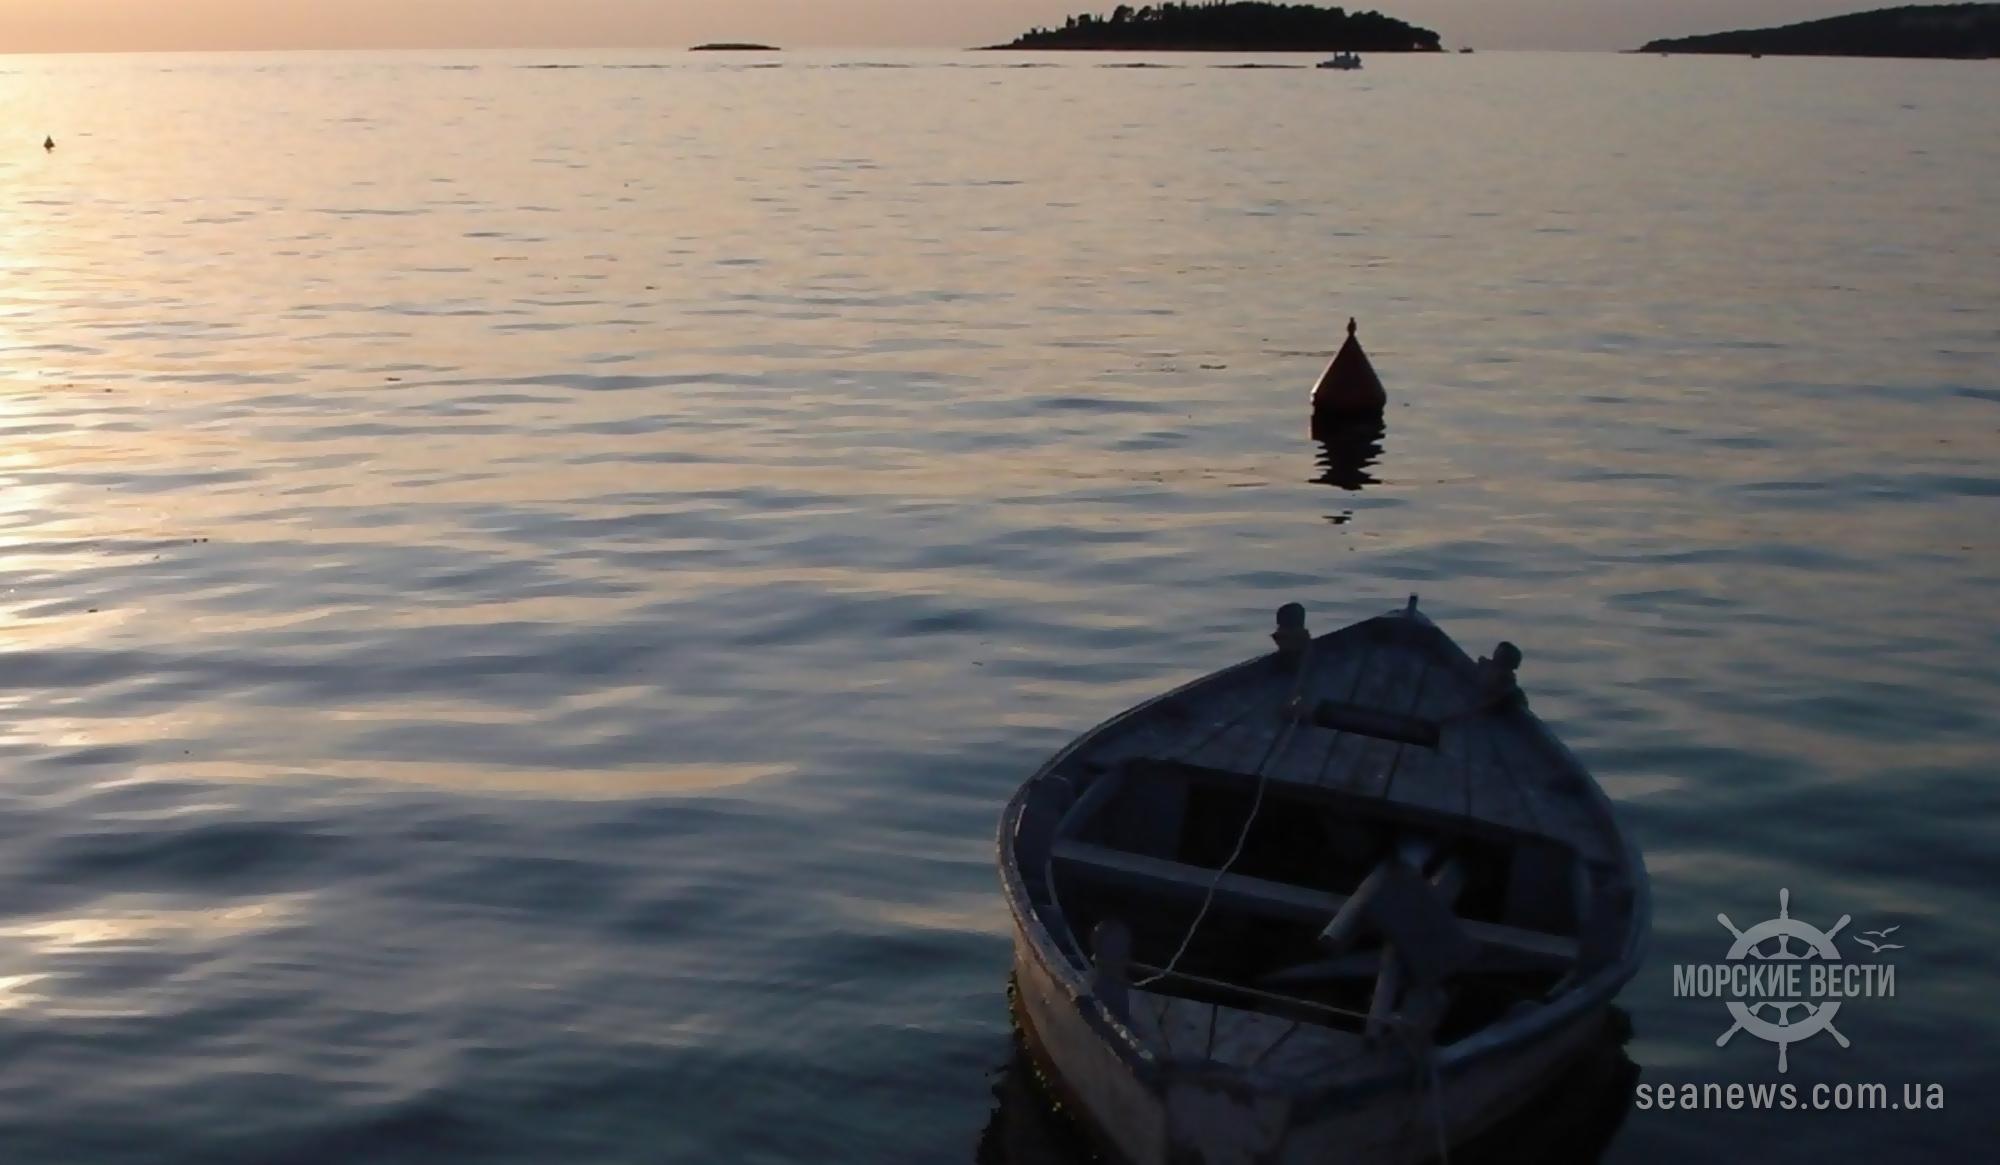 На Херсонщине лодка с рыбаками попала под баржу